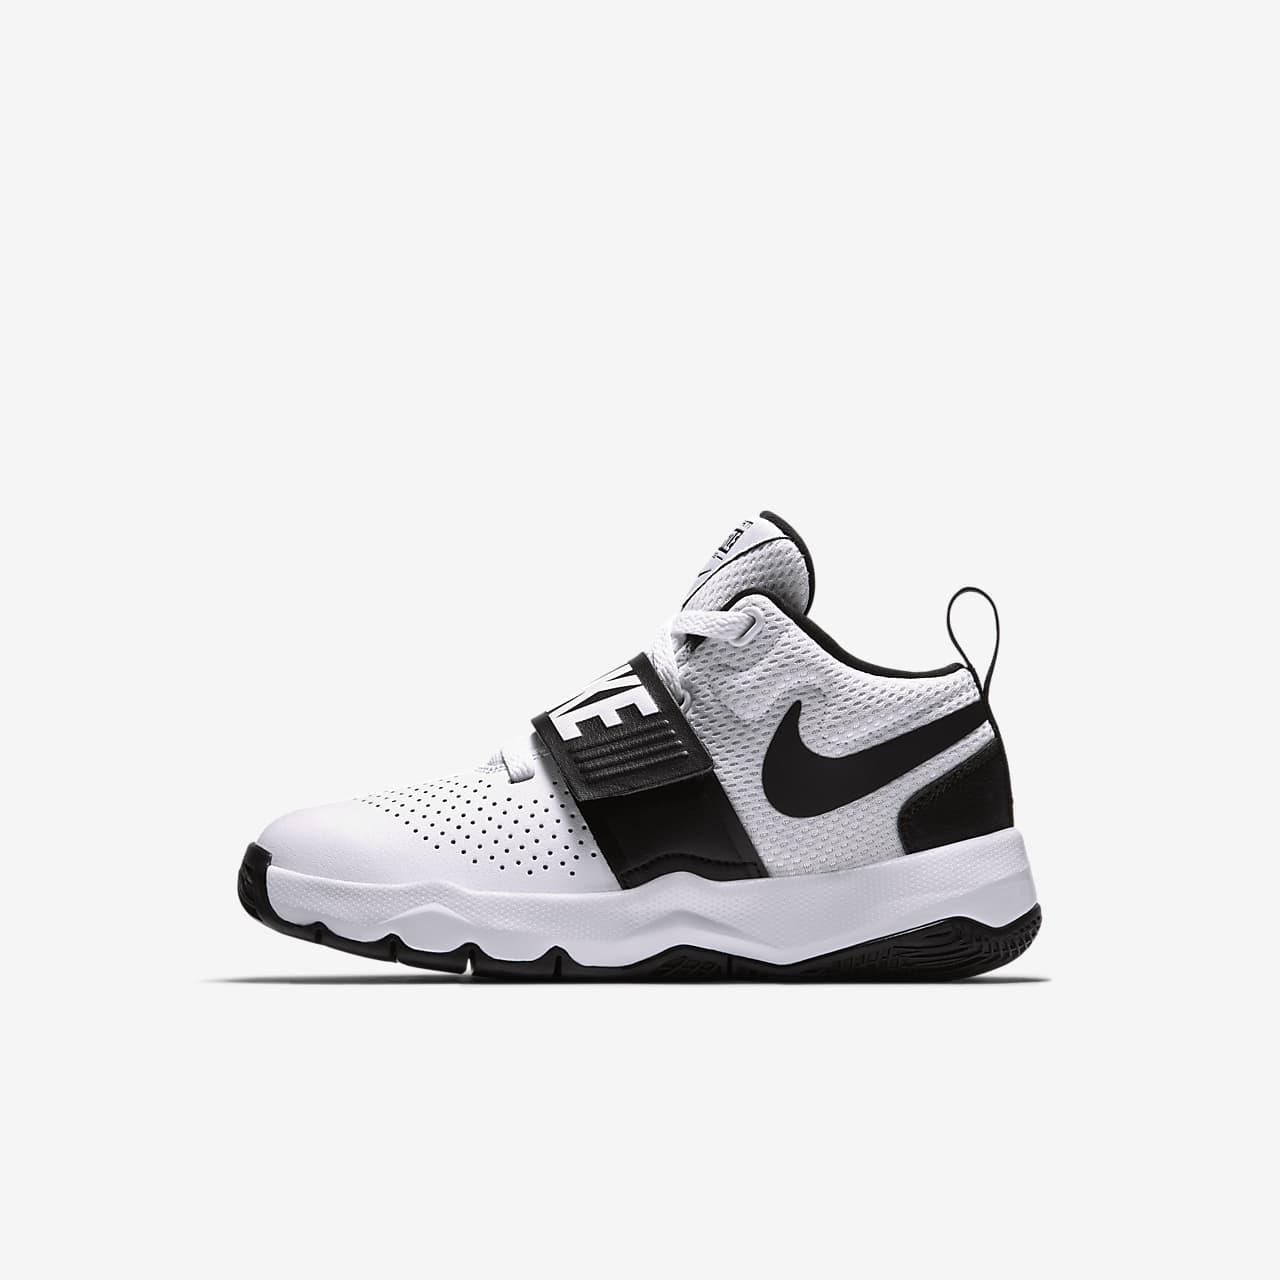 Nike Team Hustle D 8 Younger Kids' Shoe